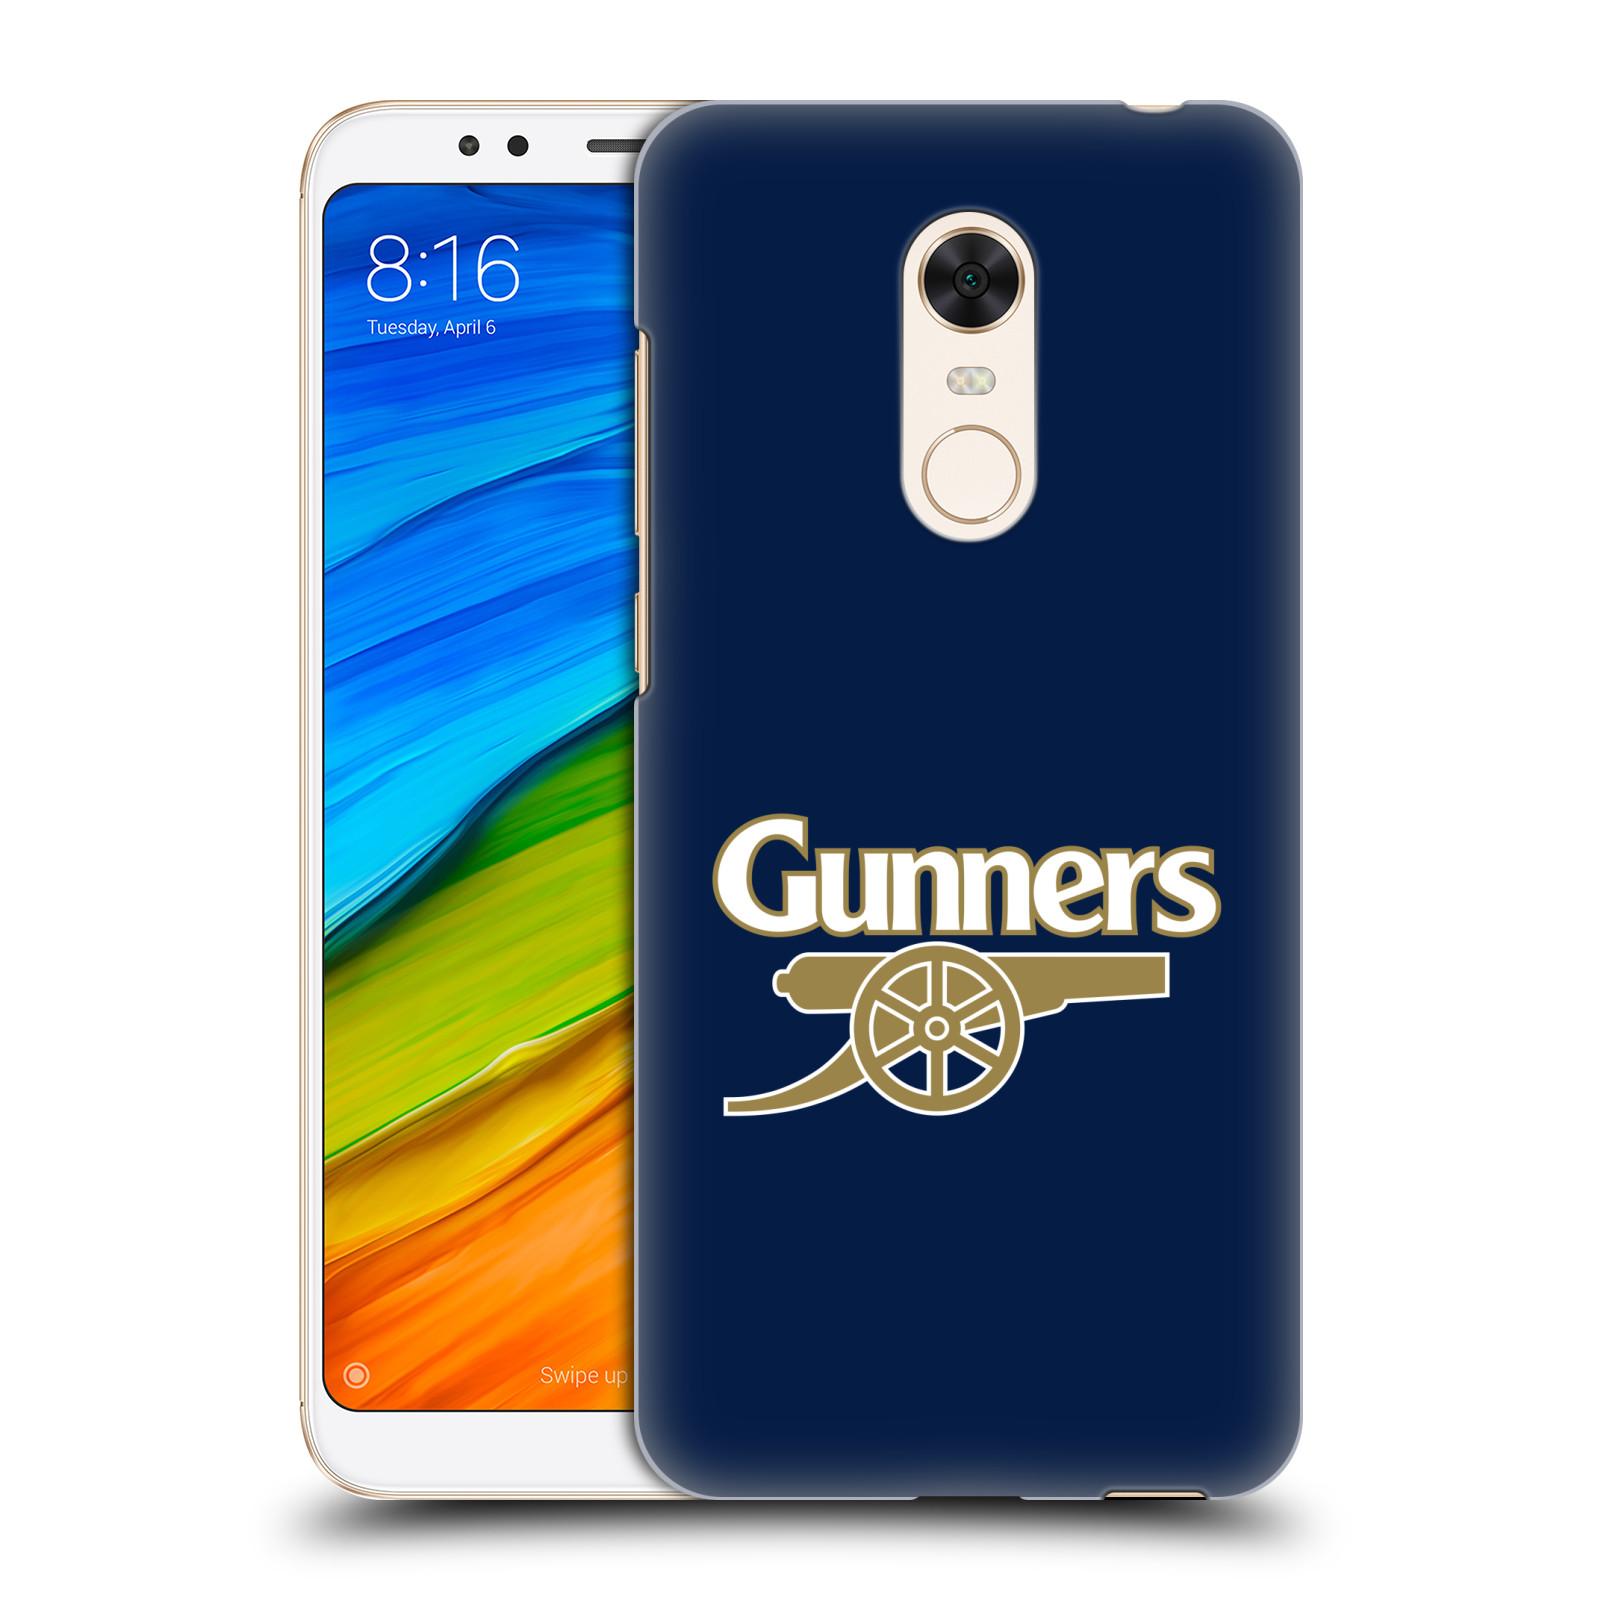 Plastové pouzdro na mobil Xiaomi Redmi 5 Plus - Head Case - Arsenal FC - Gunners